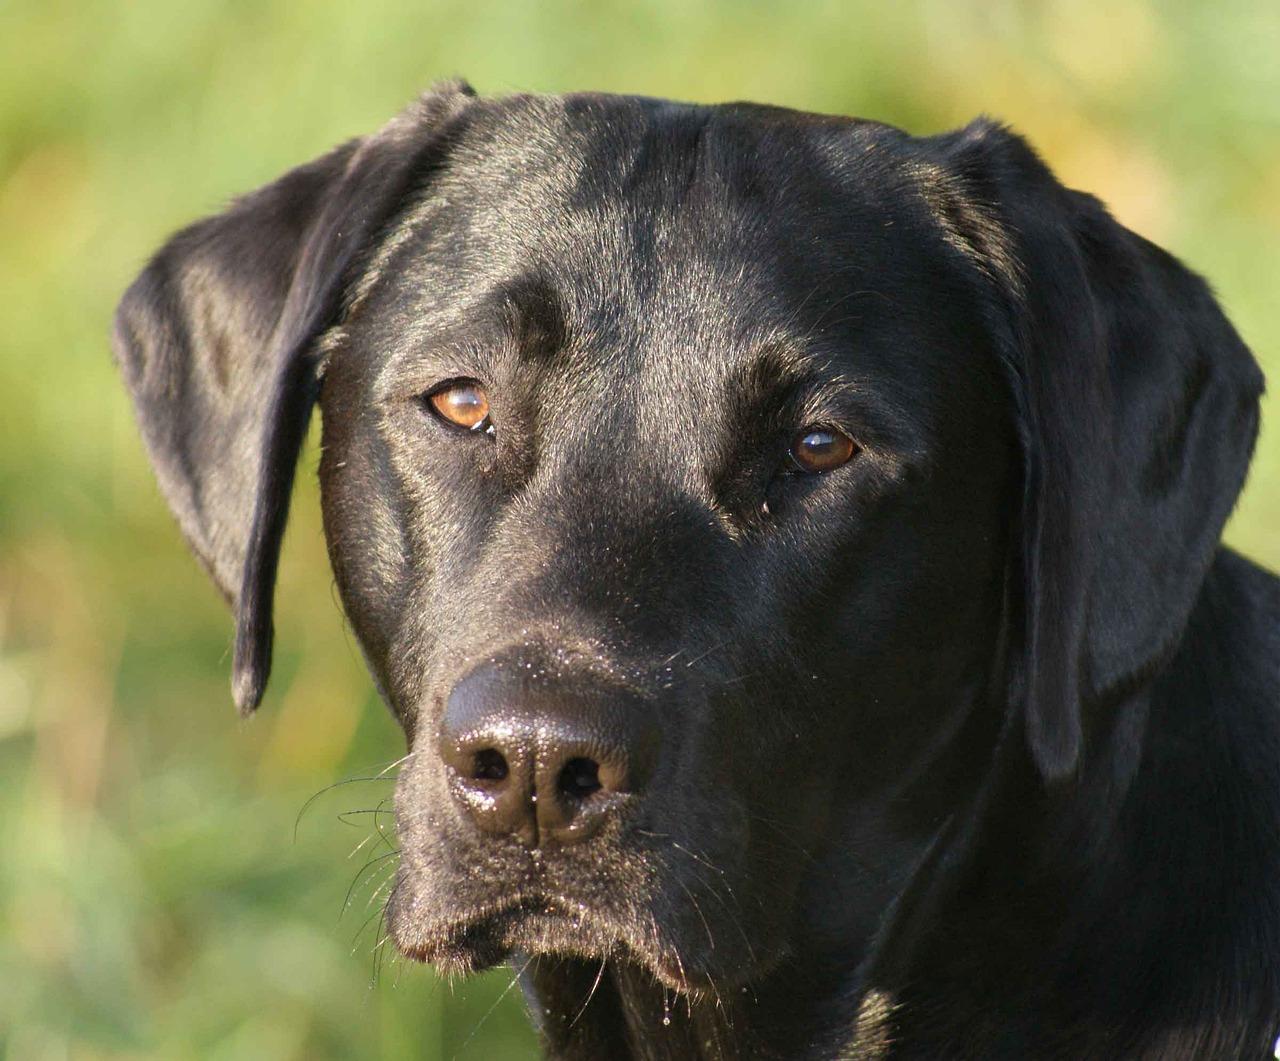 Фрай картинки, картинки лабрадора собаки